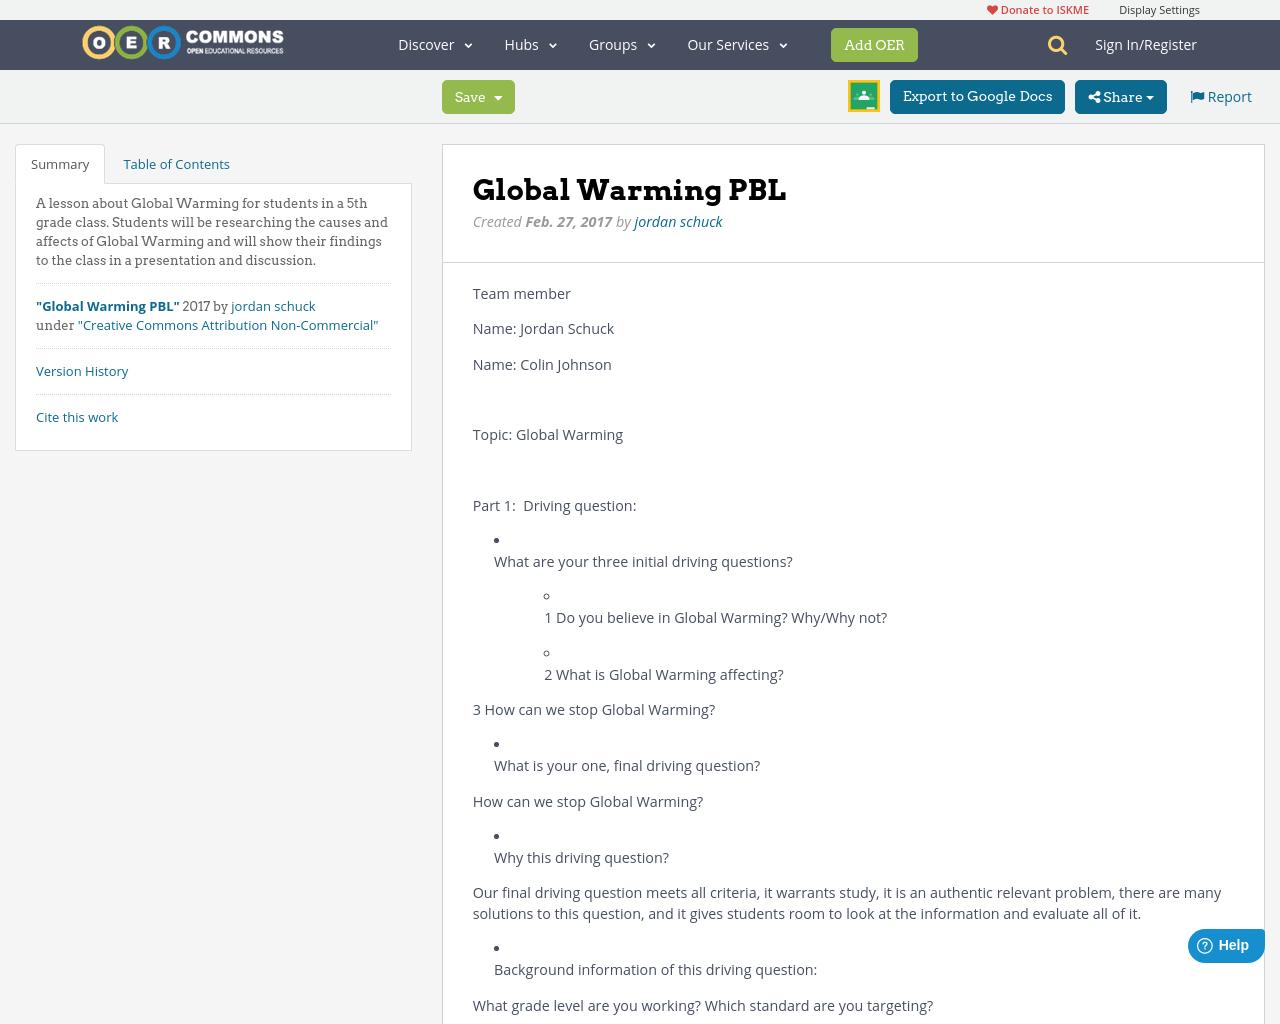 Media Global Warming: Global Warming PBL